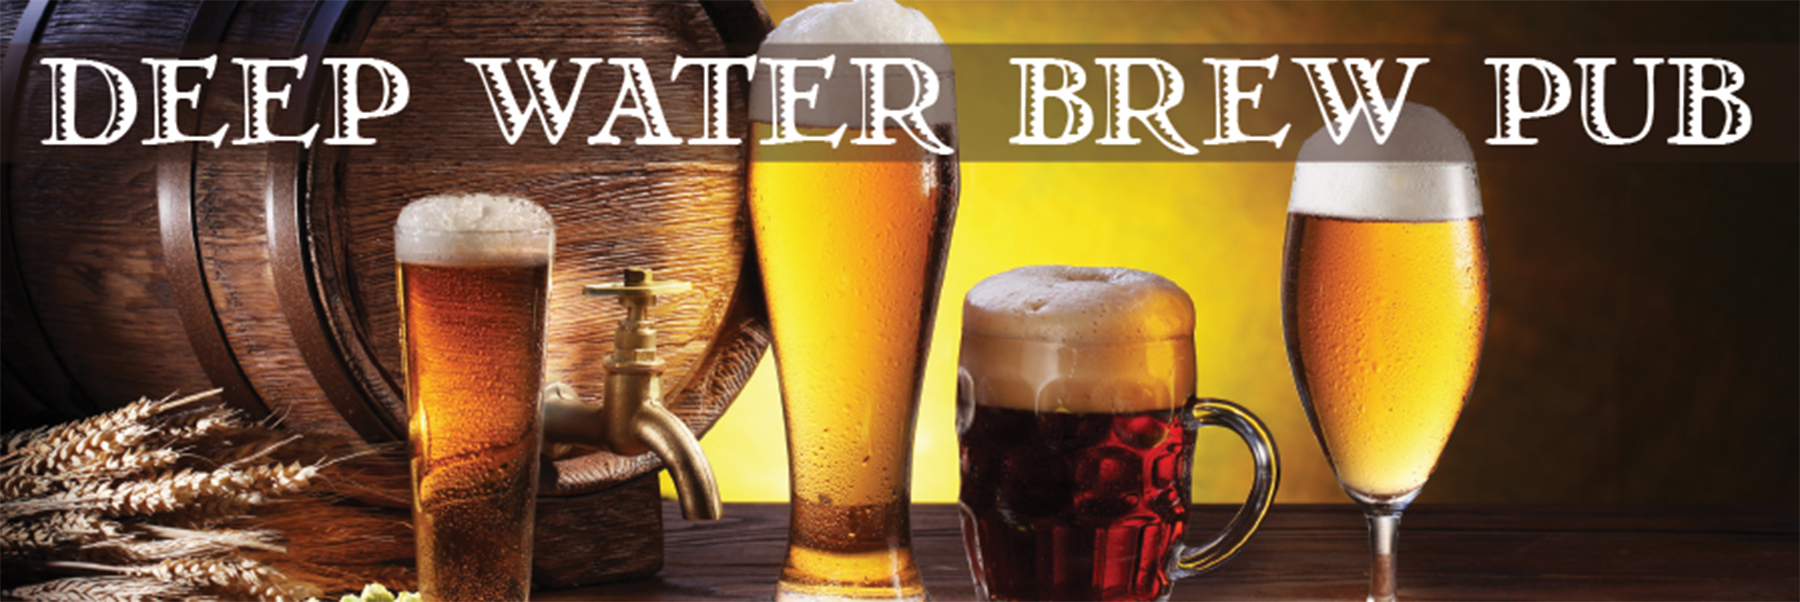 Deepwater Brew Pub sub image.jpg